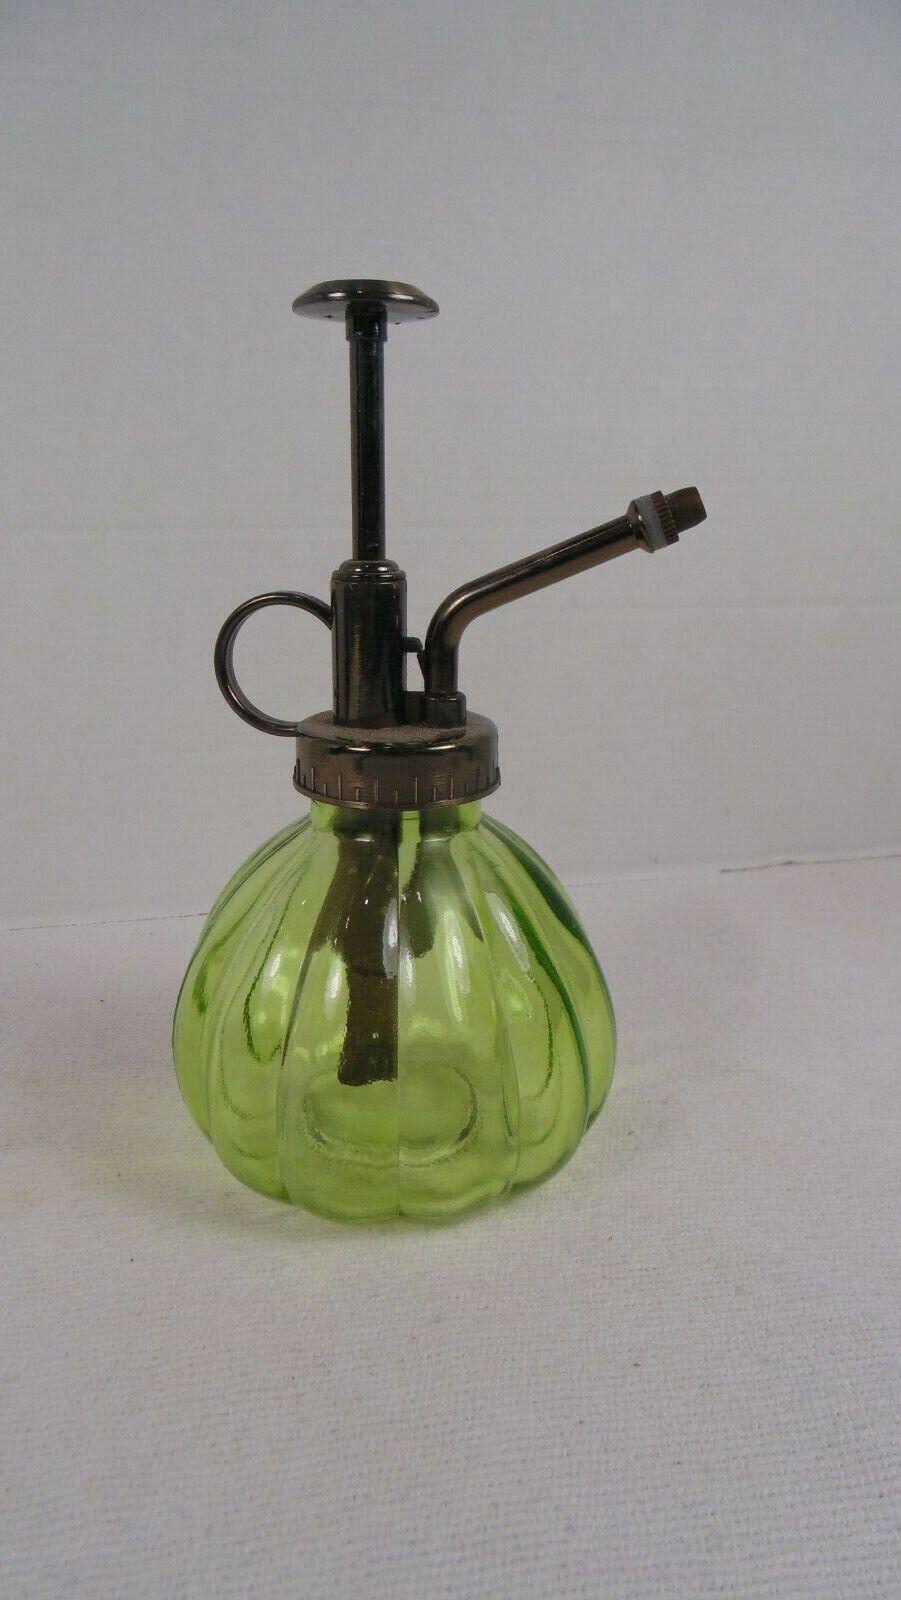 Plant Mister Glass Spray Bottle Small Plant Green 5